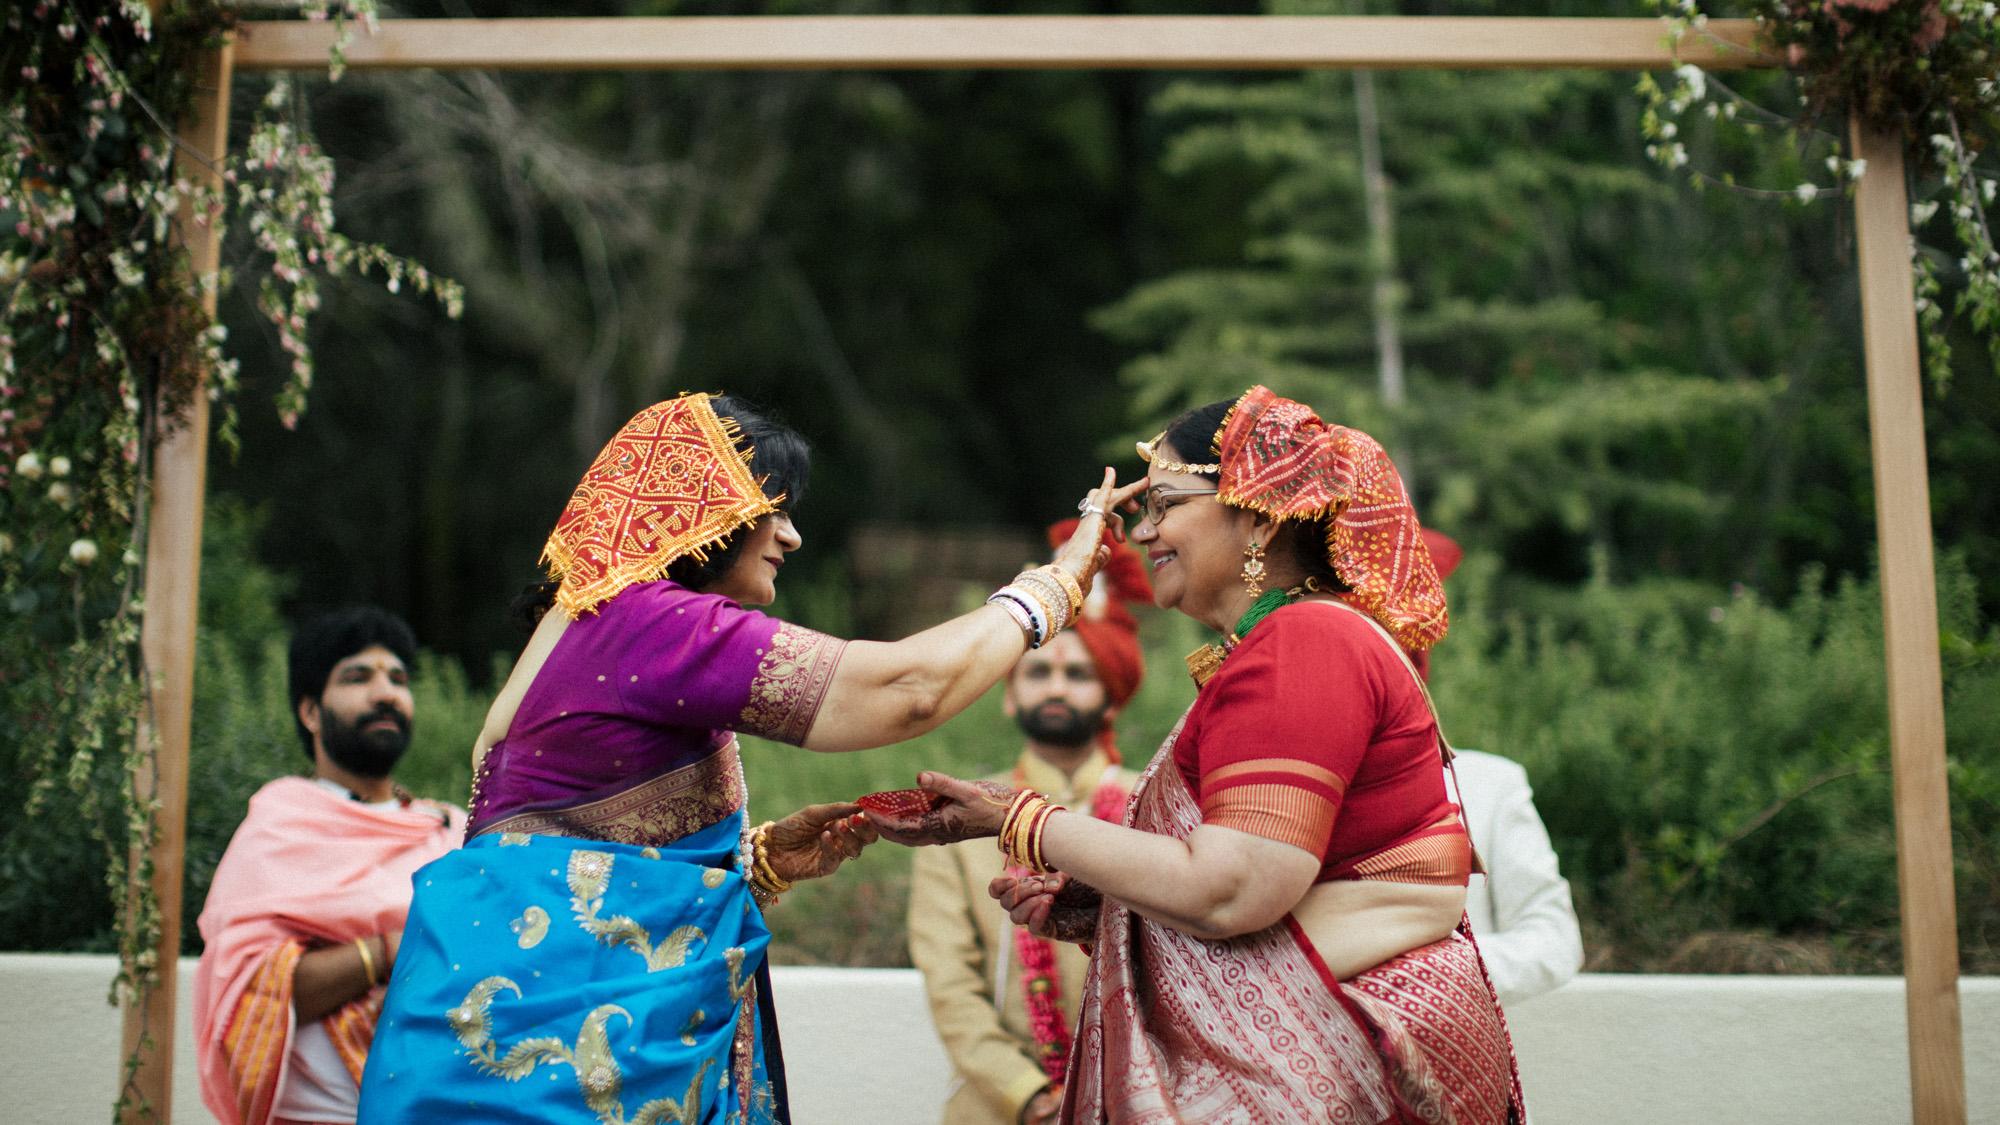 anu_maneesh_alec_vanderboom_Indian_wedding_photography-0095.jpg